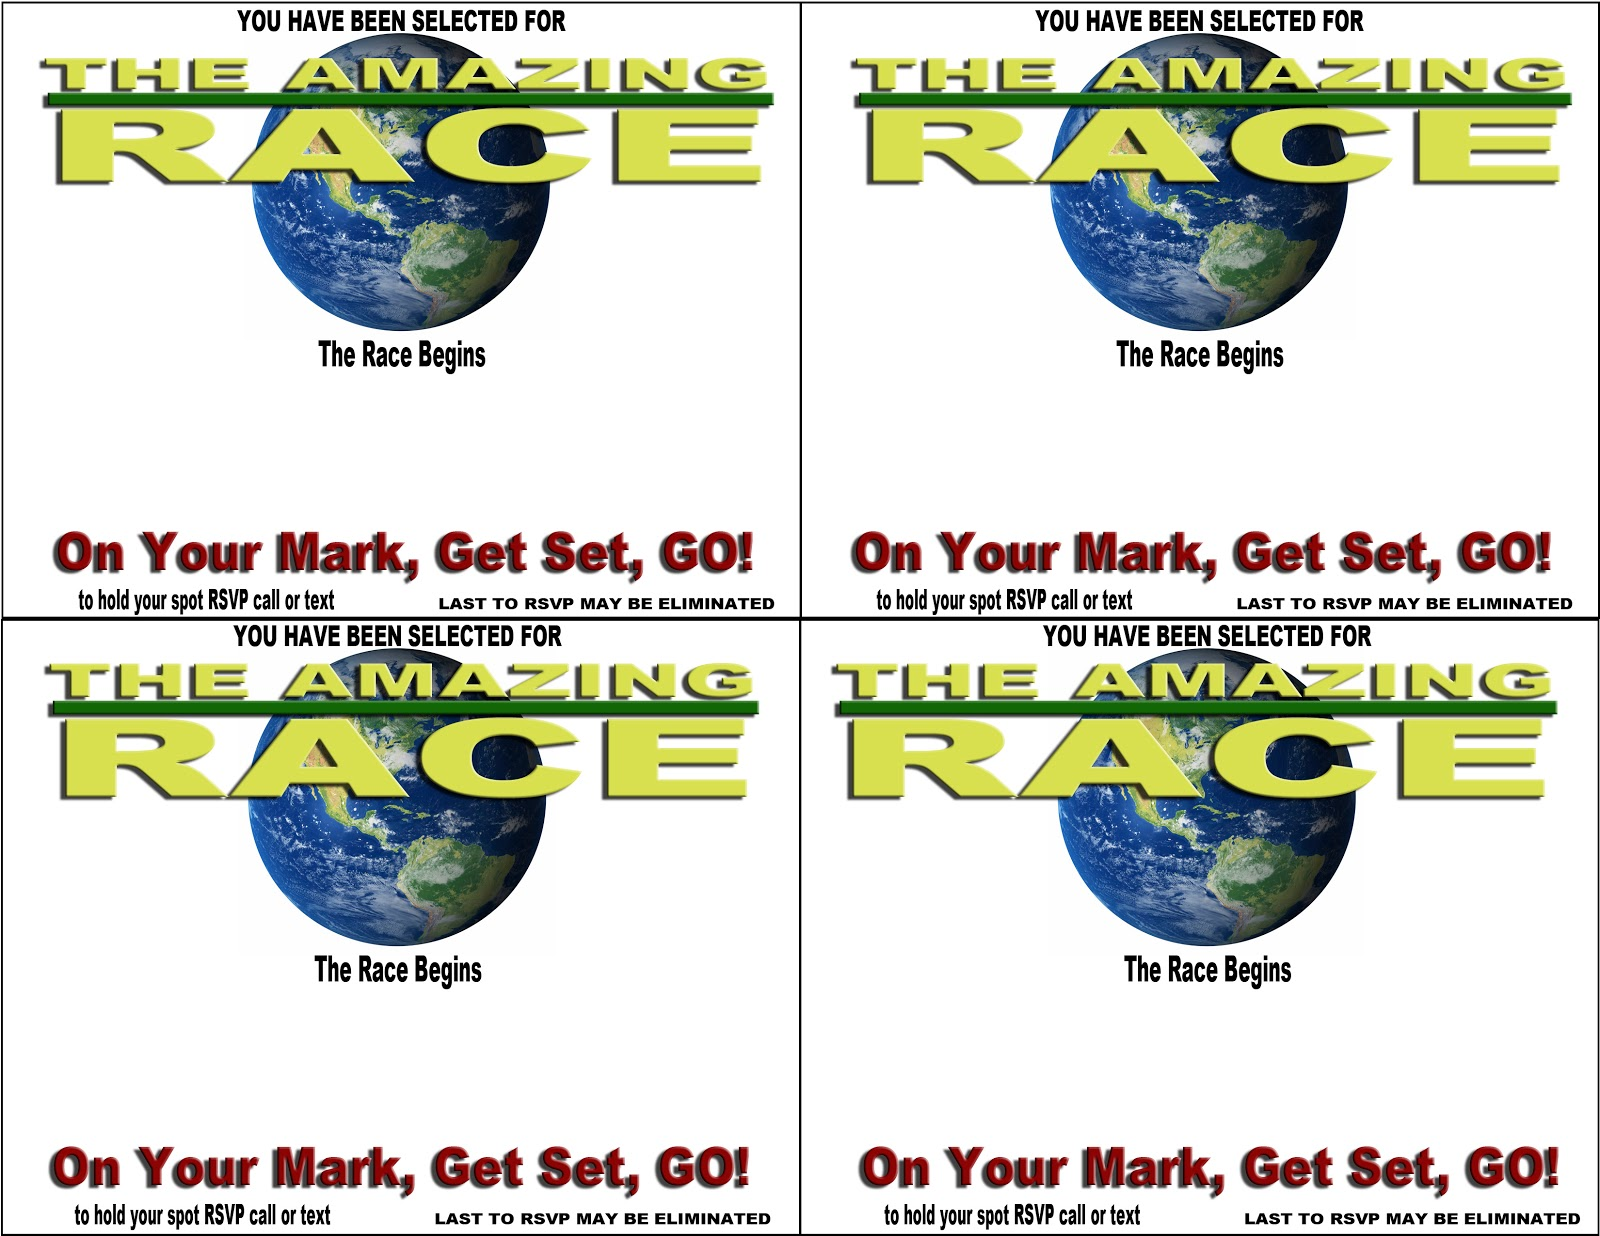 amazing race birthday party templates - amazing race party invitations party invitations ideas